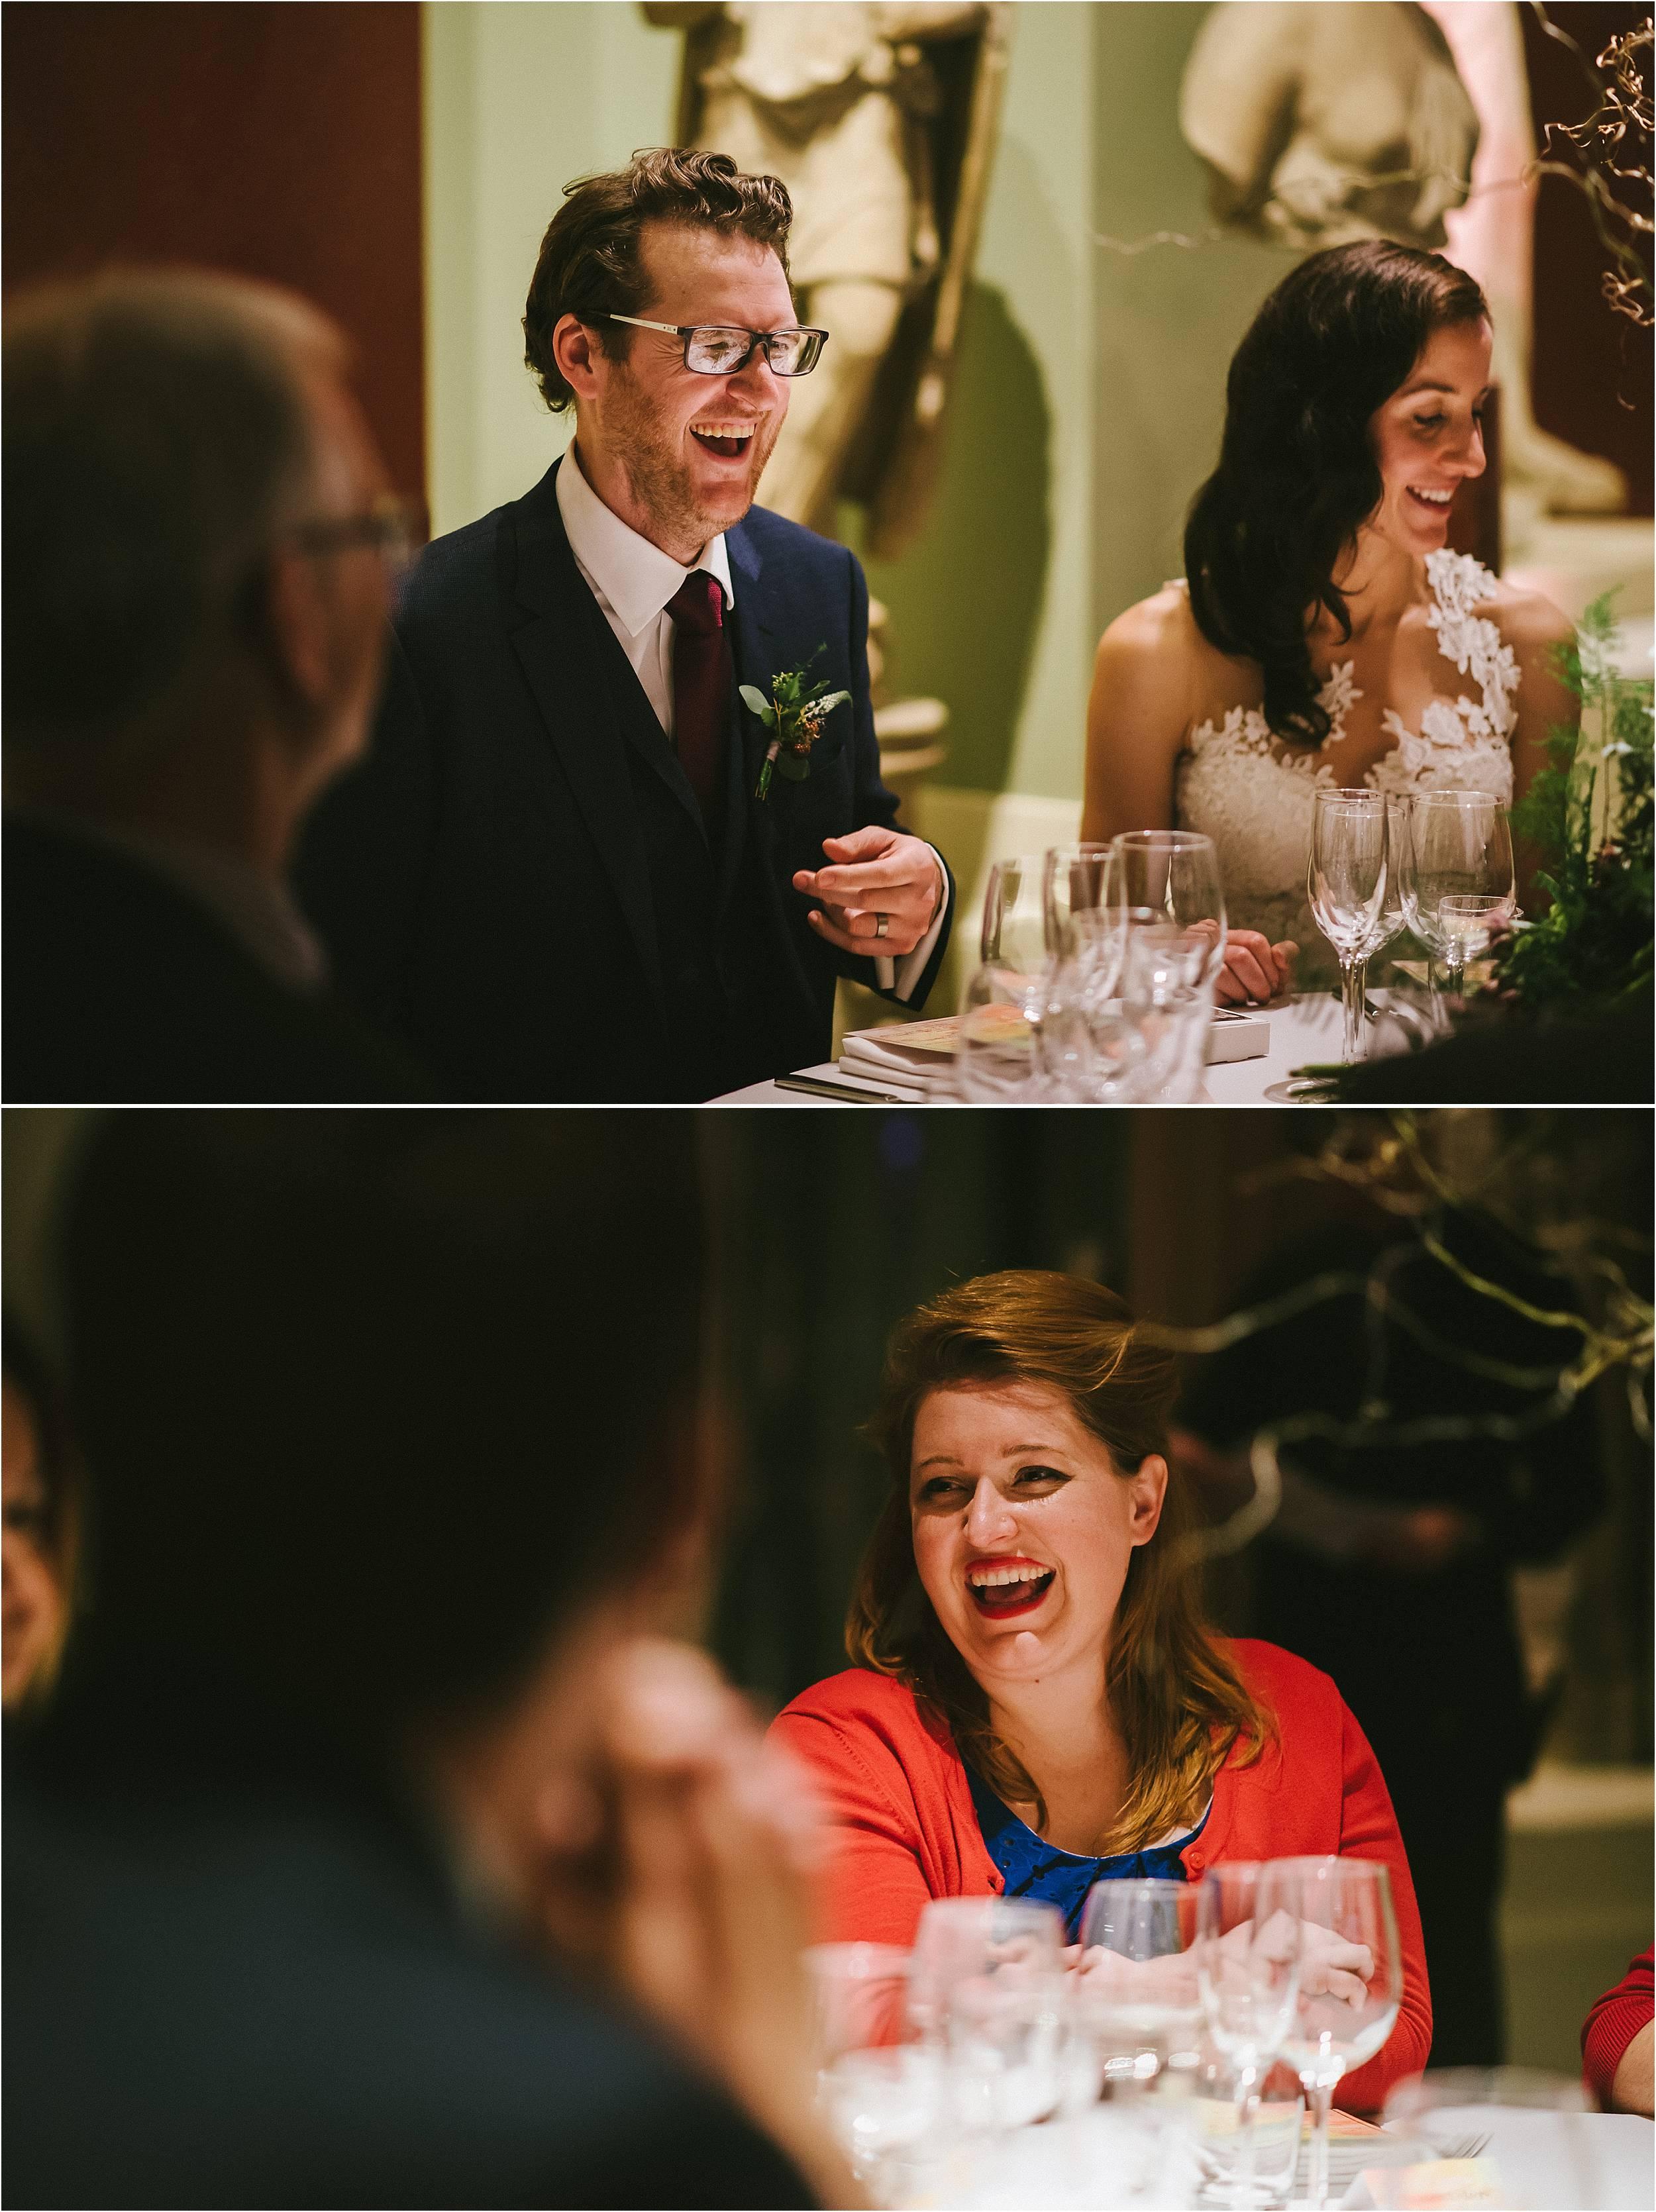 Oxford Ashmolean Museum Wedding Photography_0136.jpg